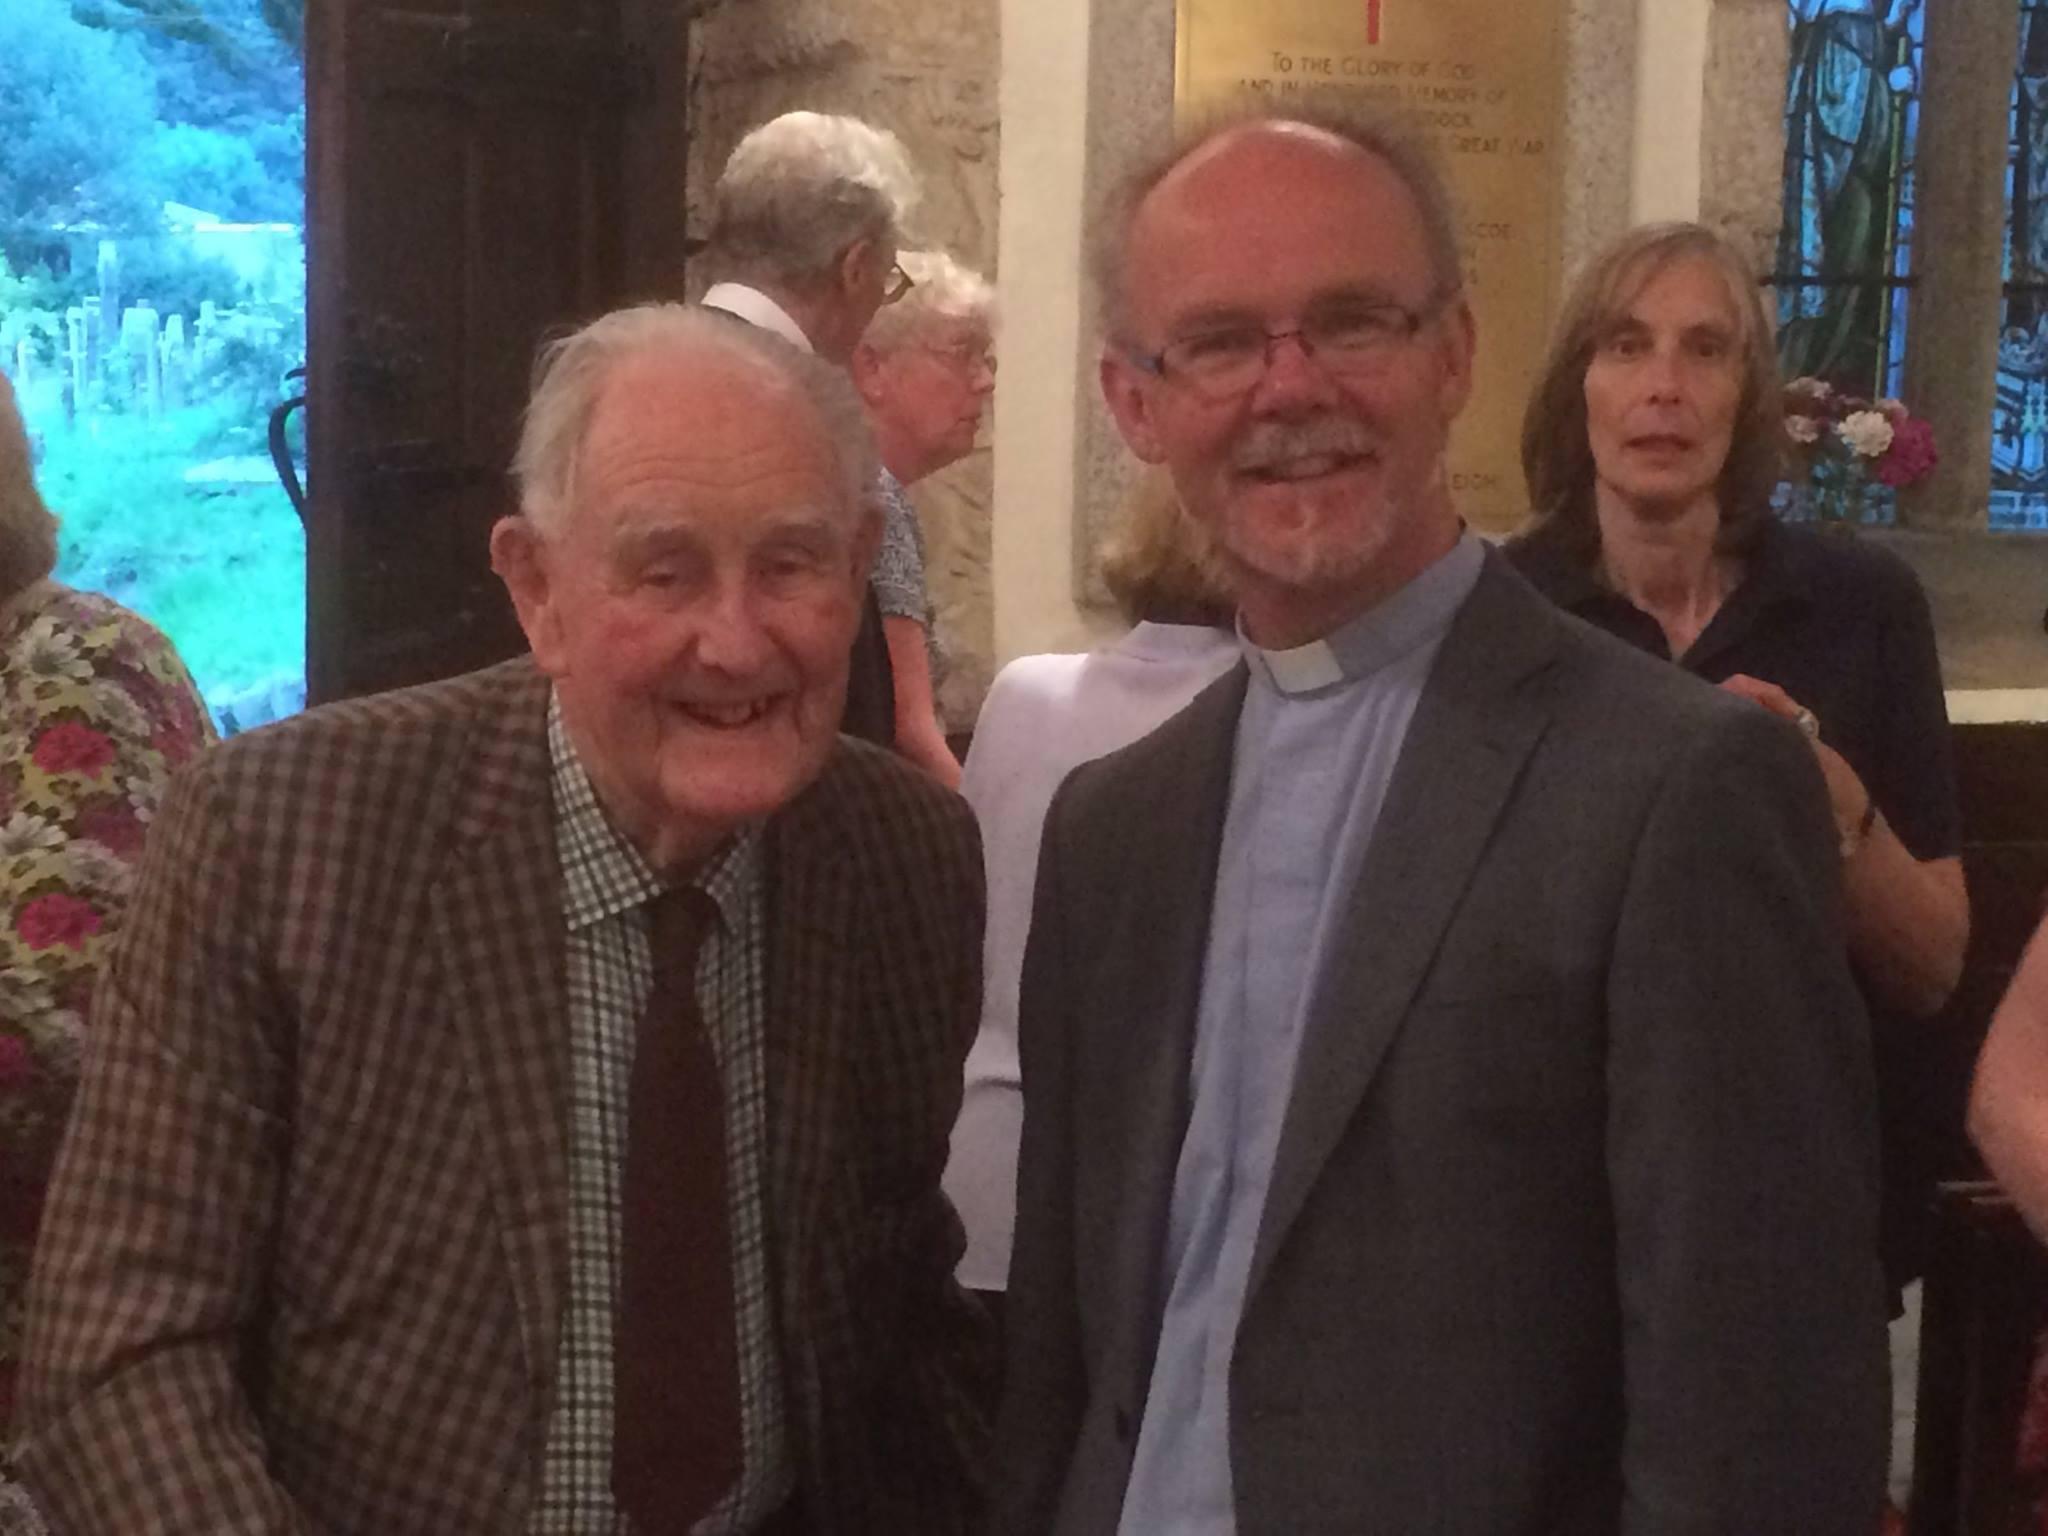 Geoff & Alan Muirhead